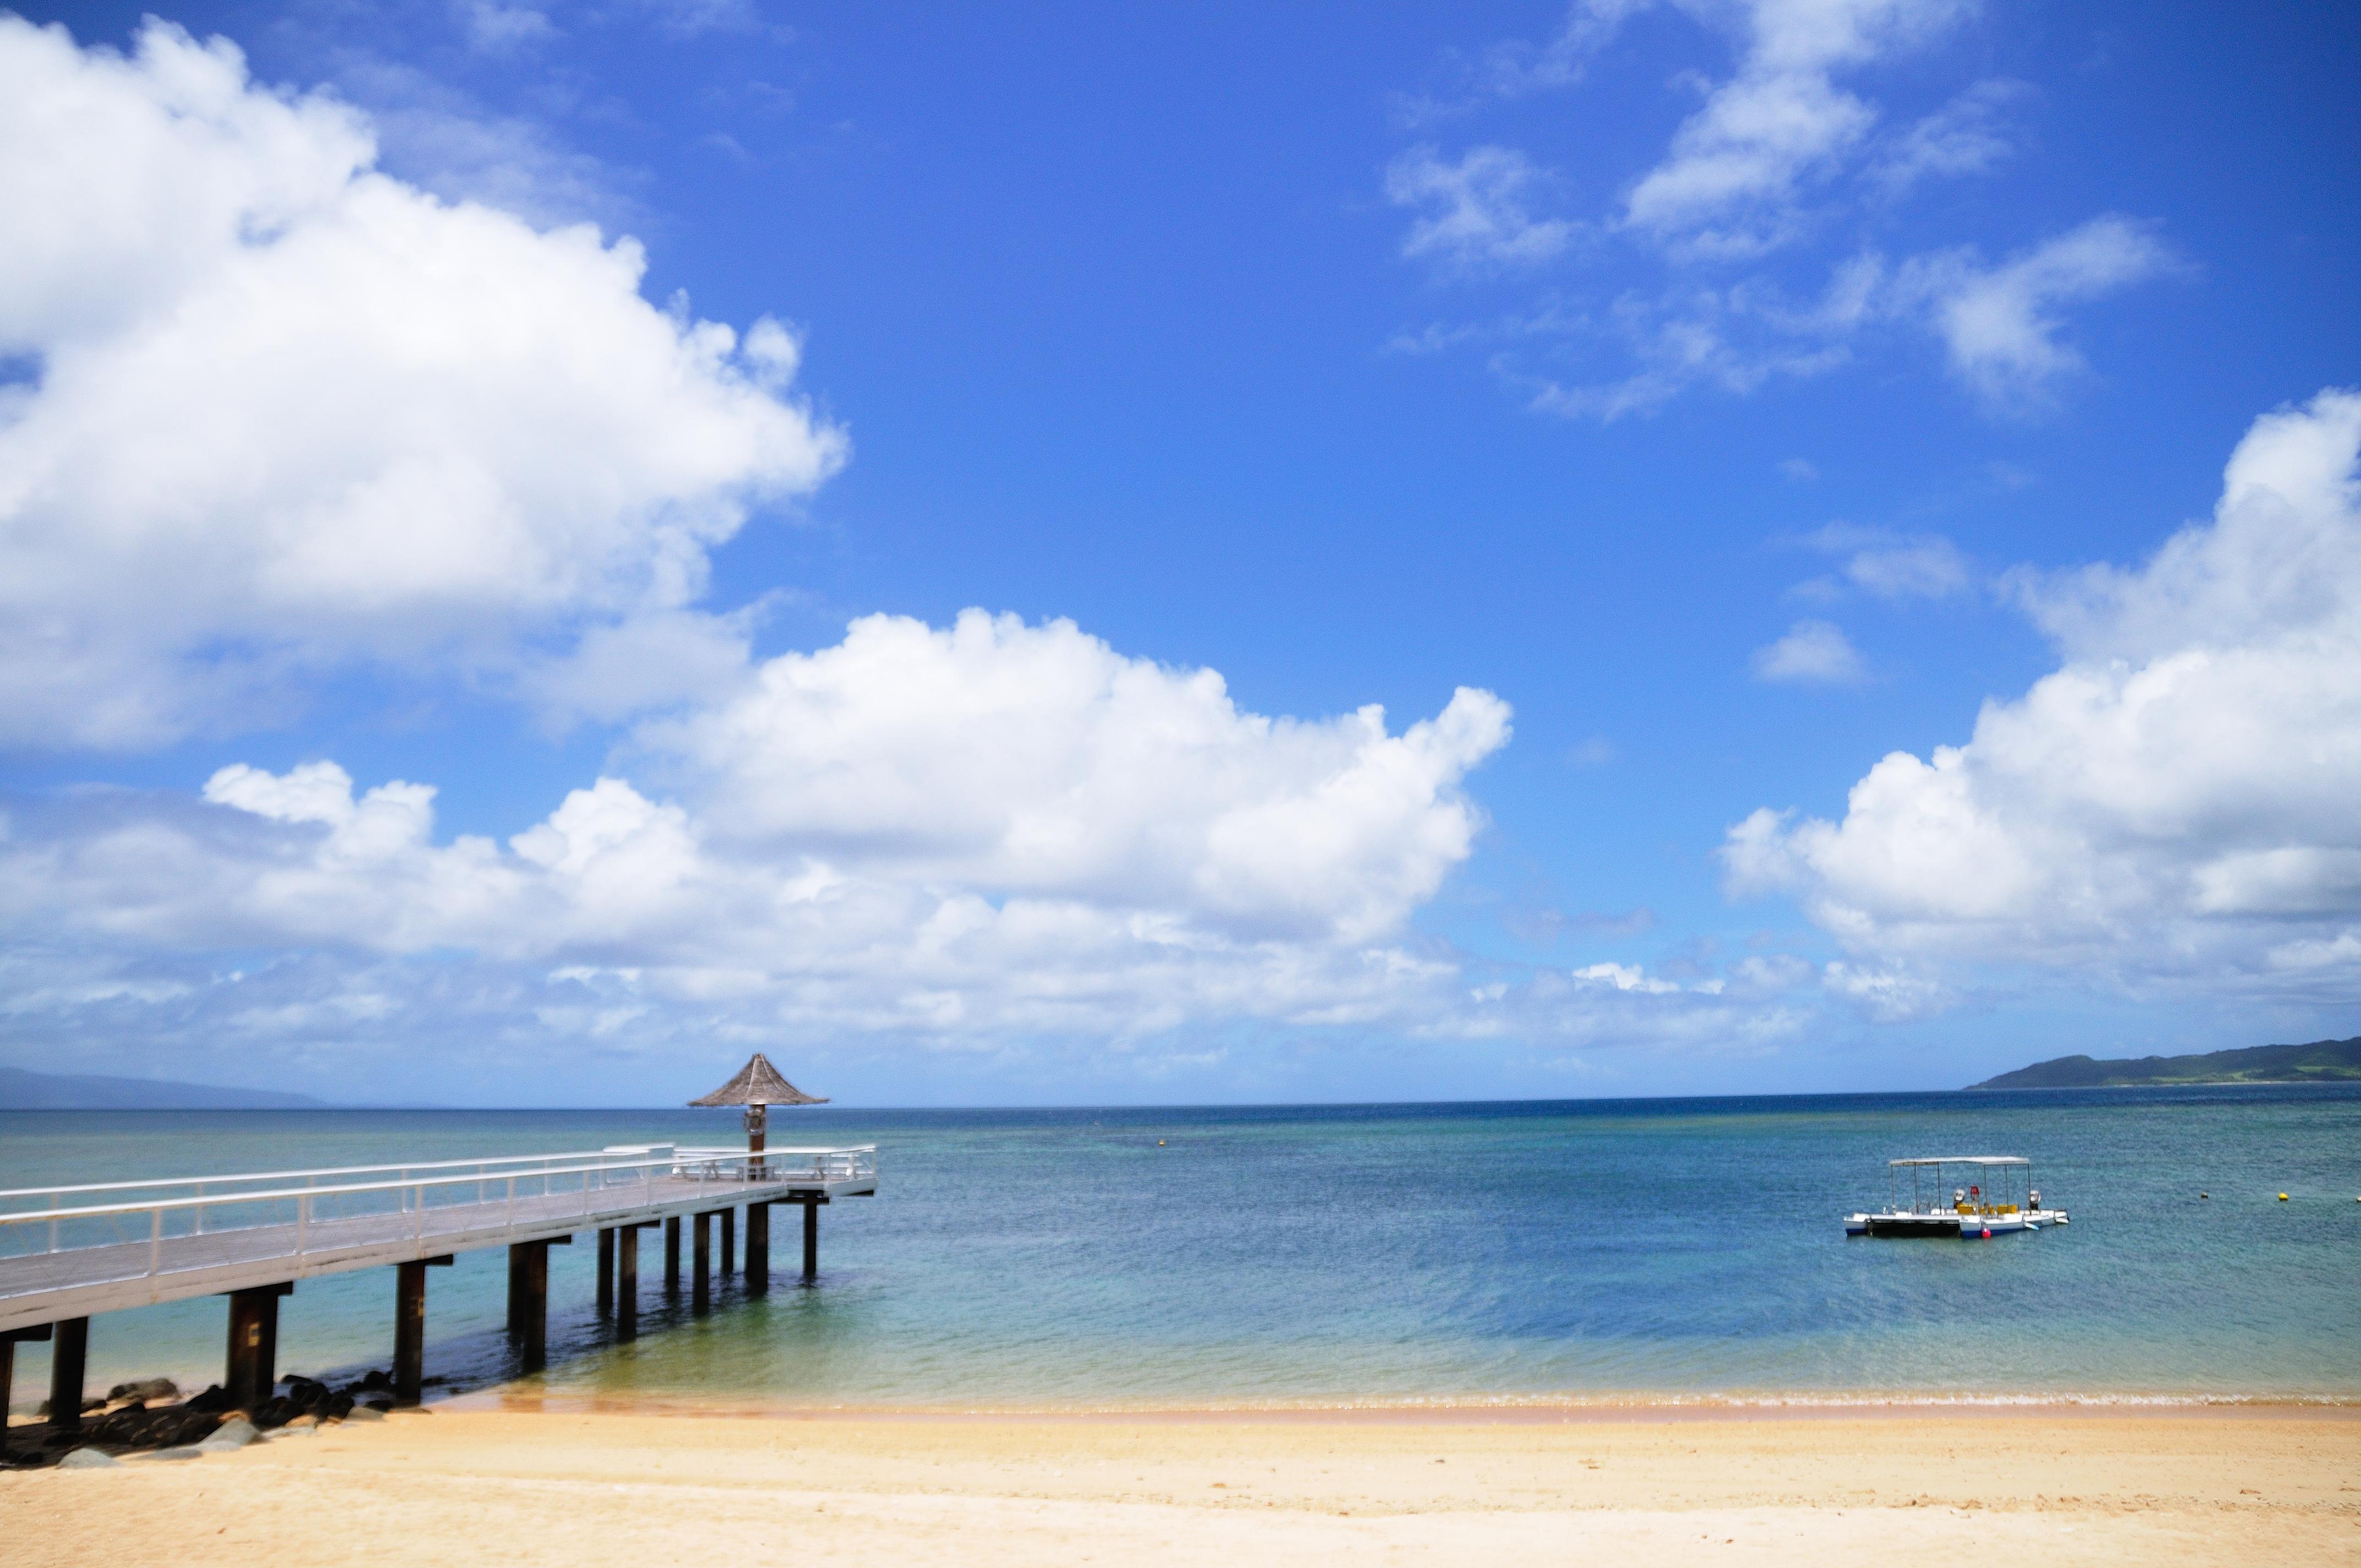 Ishigaki Japan  city pictures gallery : Fusaki Beach Ishigaki Okinawa Japan Wikimedia Commons